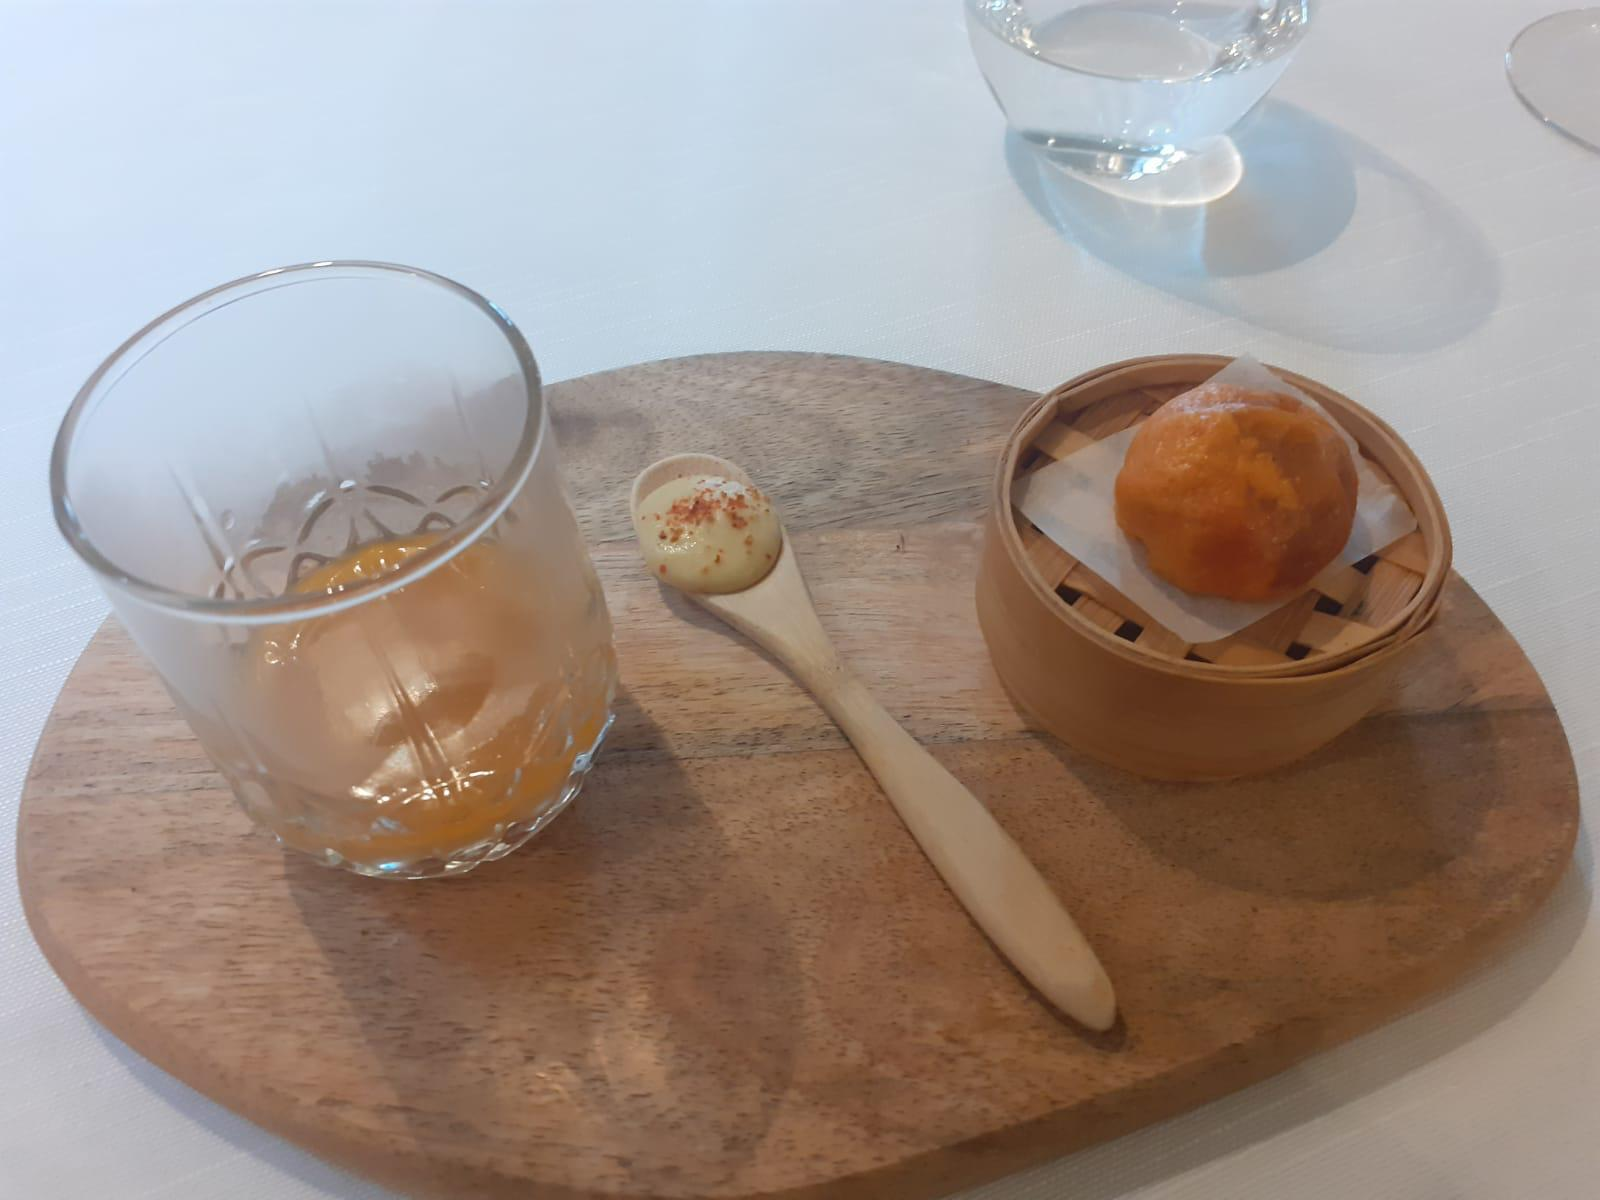 Reseña Gastronómica: Restaurante MU-Na de Ponferrada 10